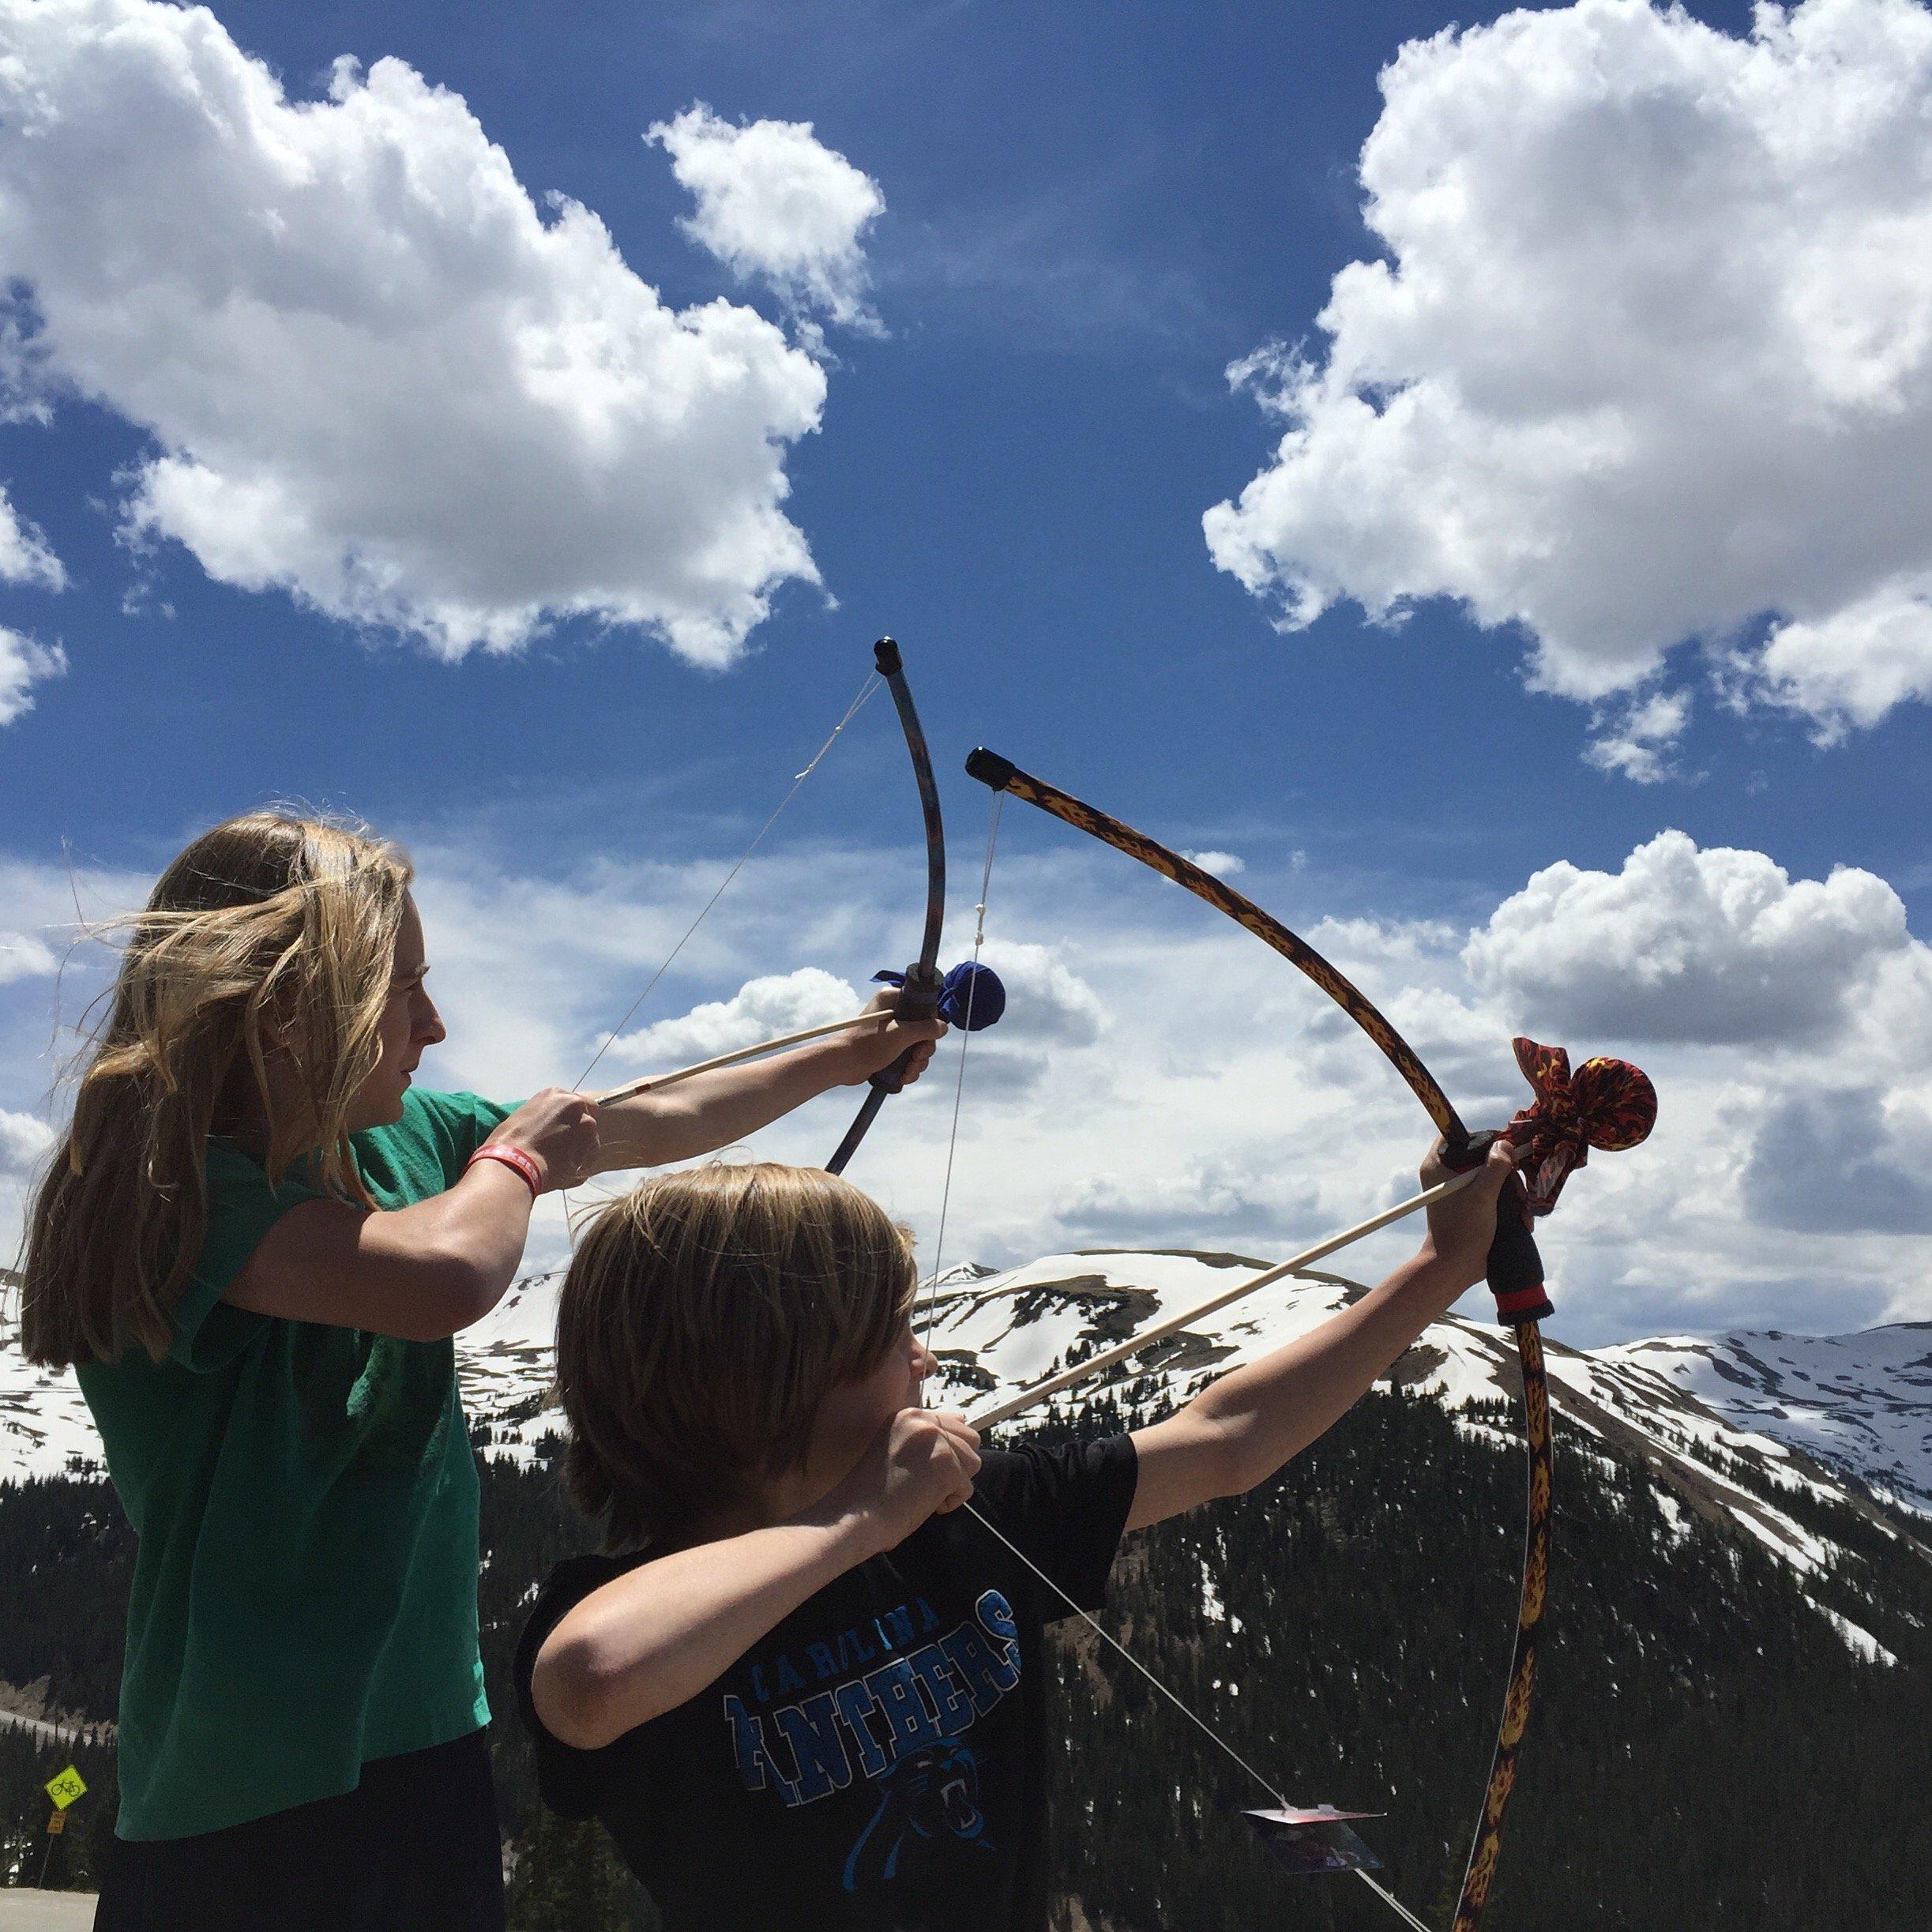 Two Bros Bows Safari Archery Combo Set